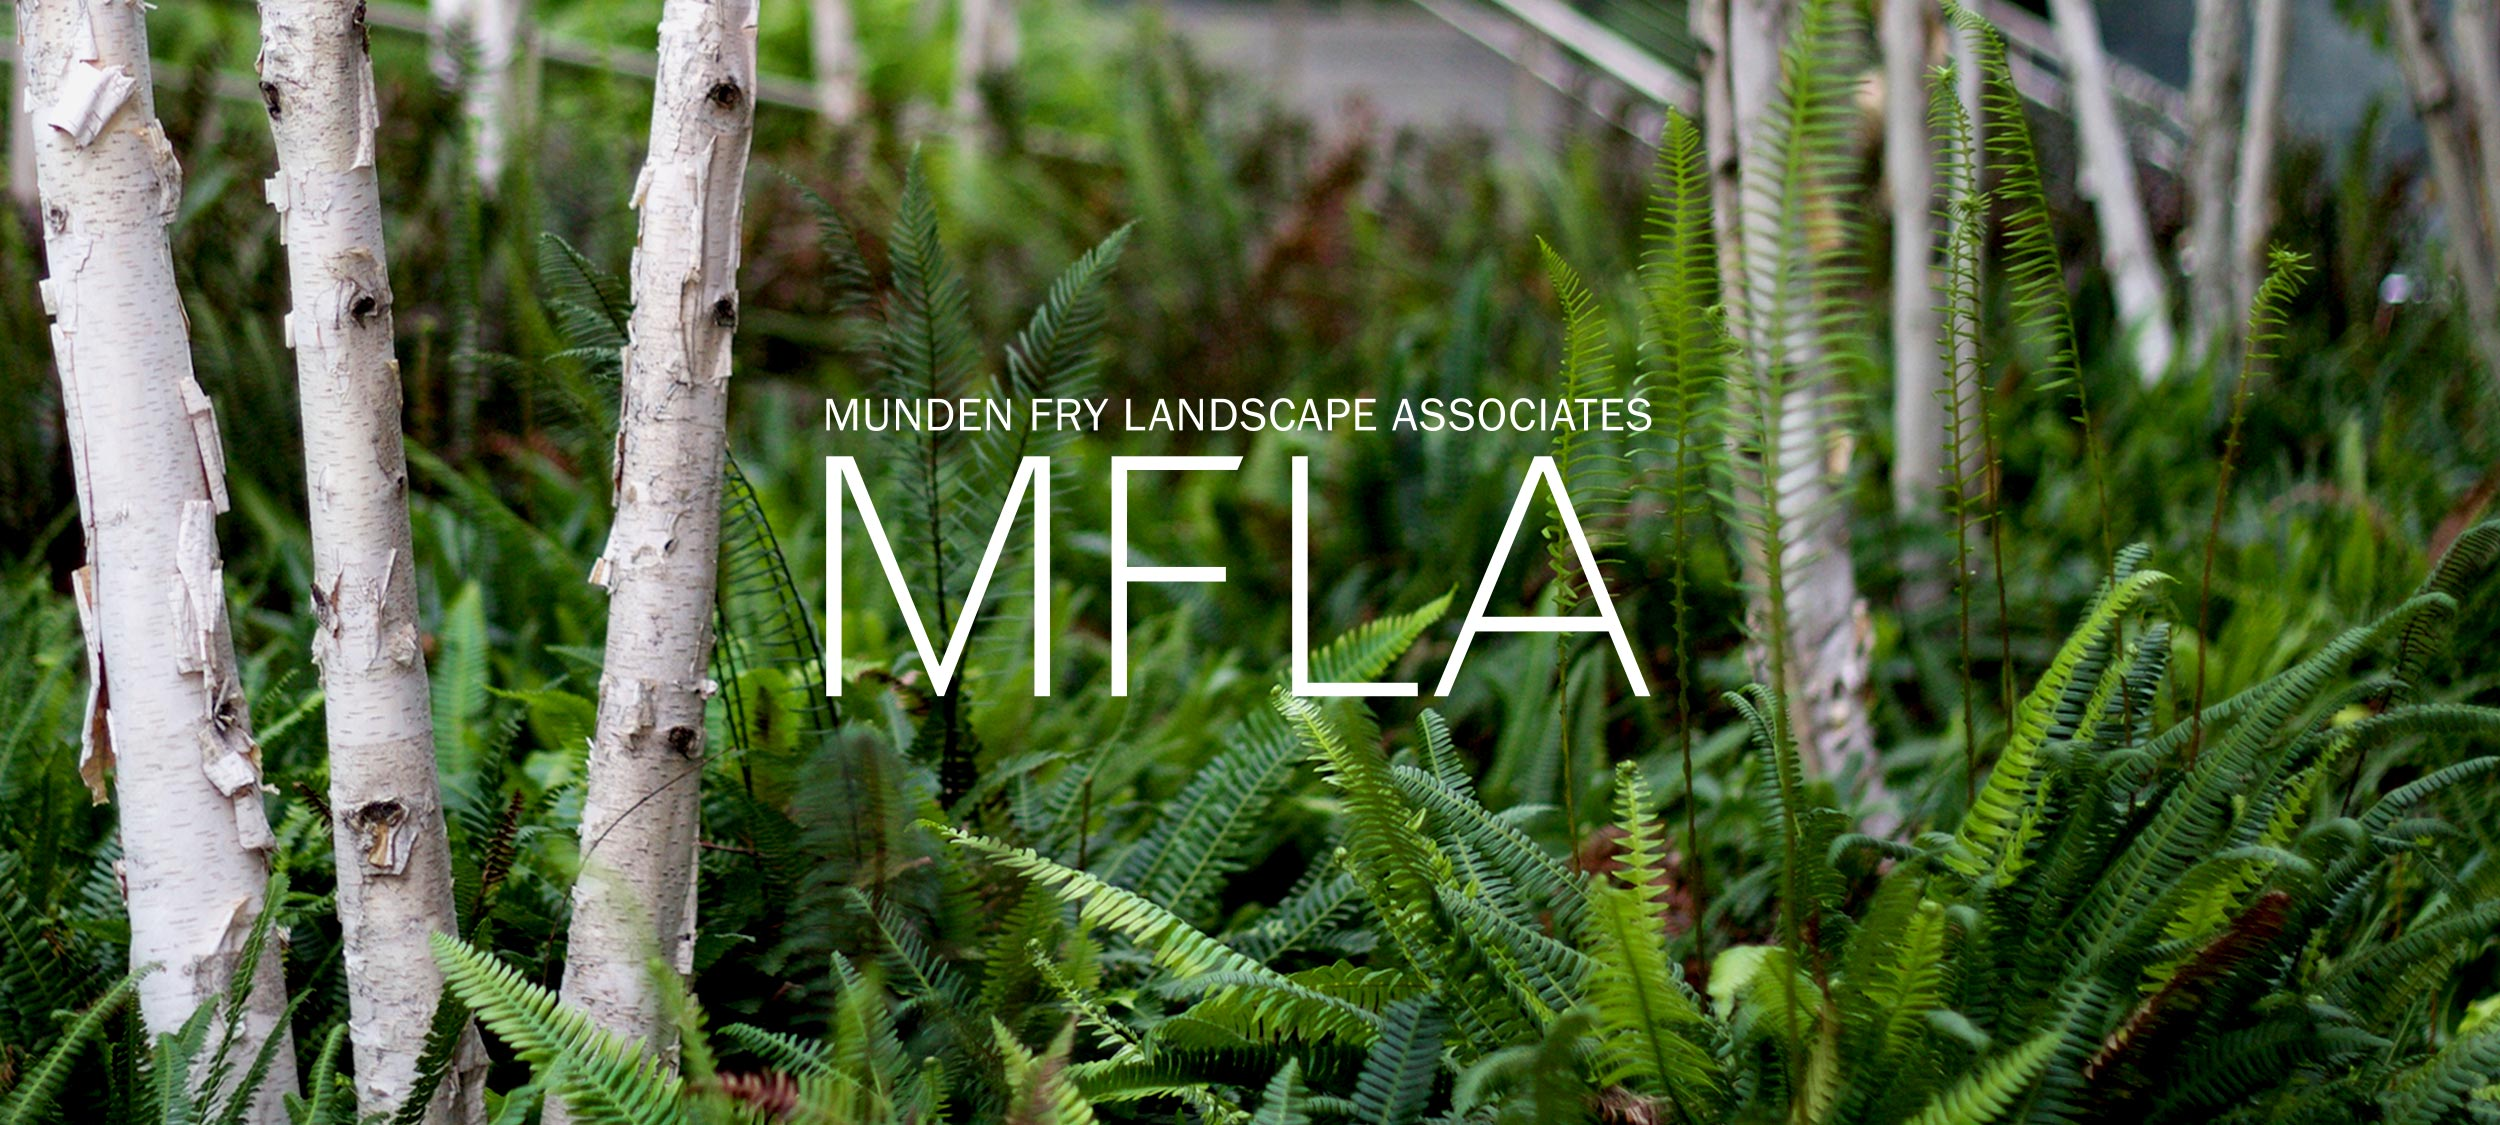 MFLA-Home-Gallery-10.jpg